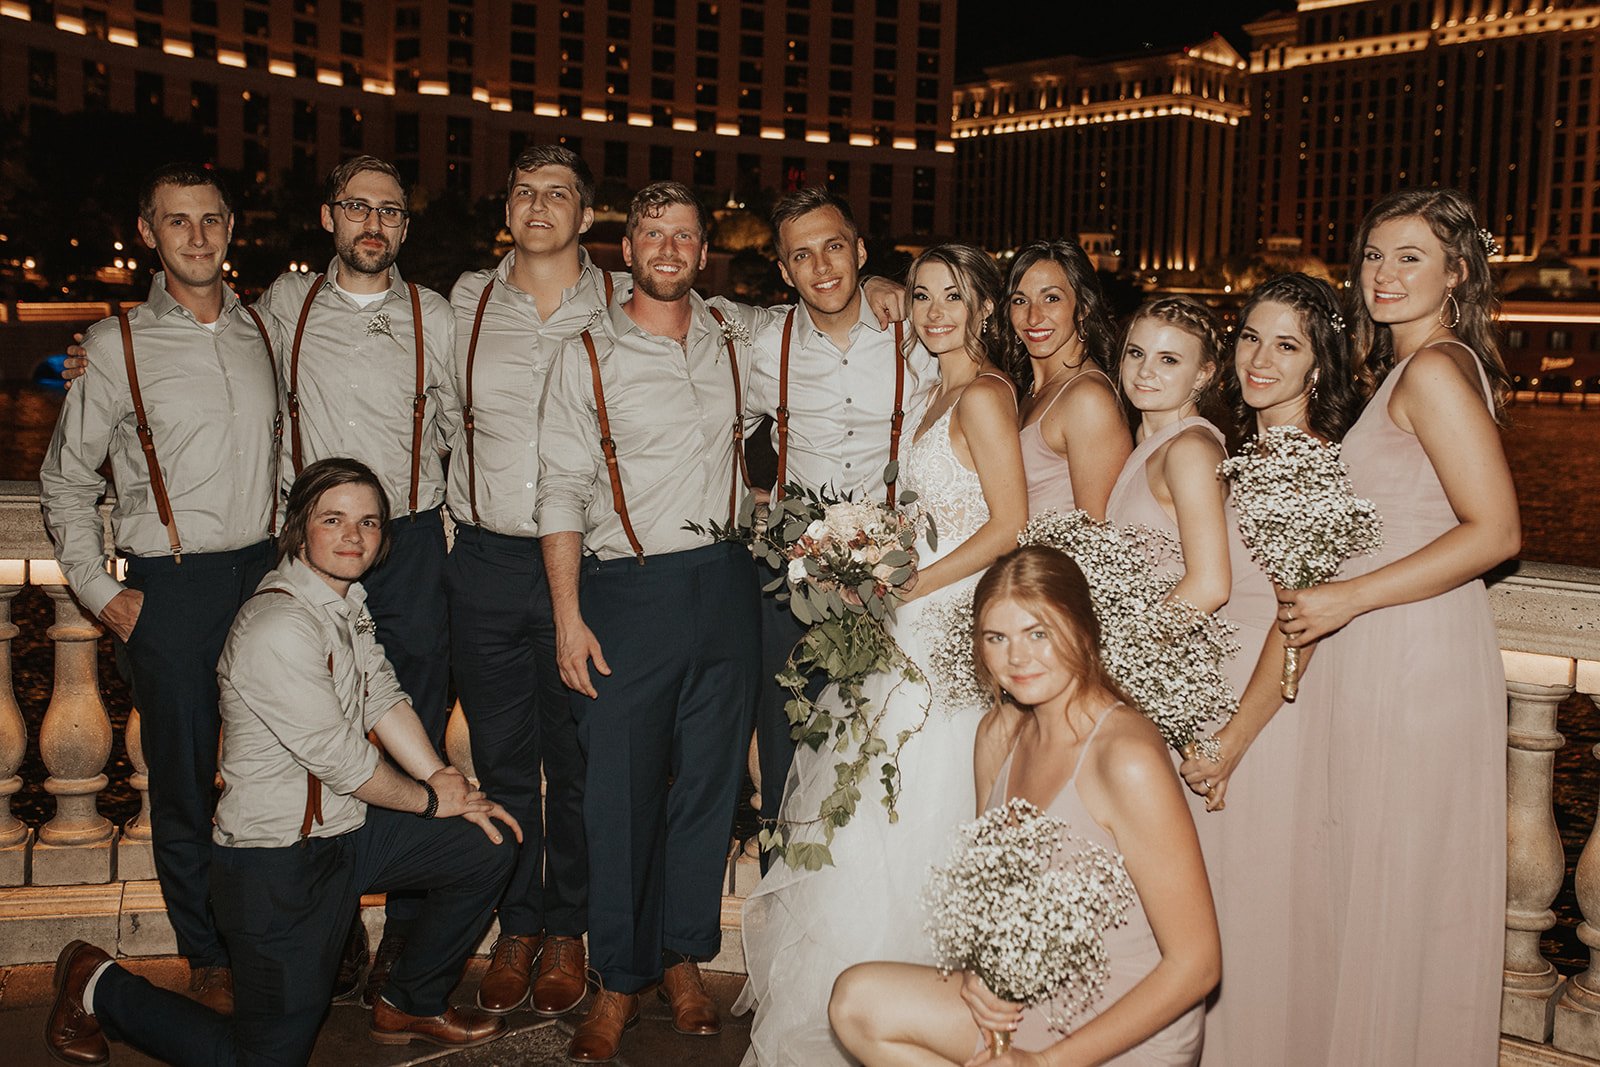 wedding party in vegas spokane bride and groom